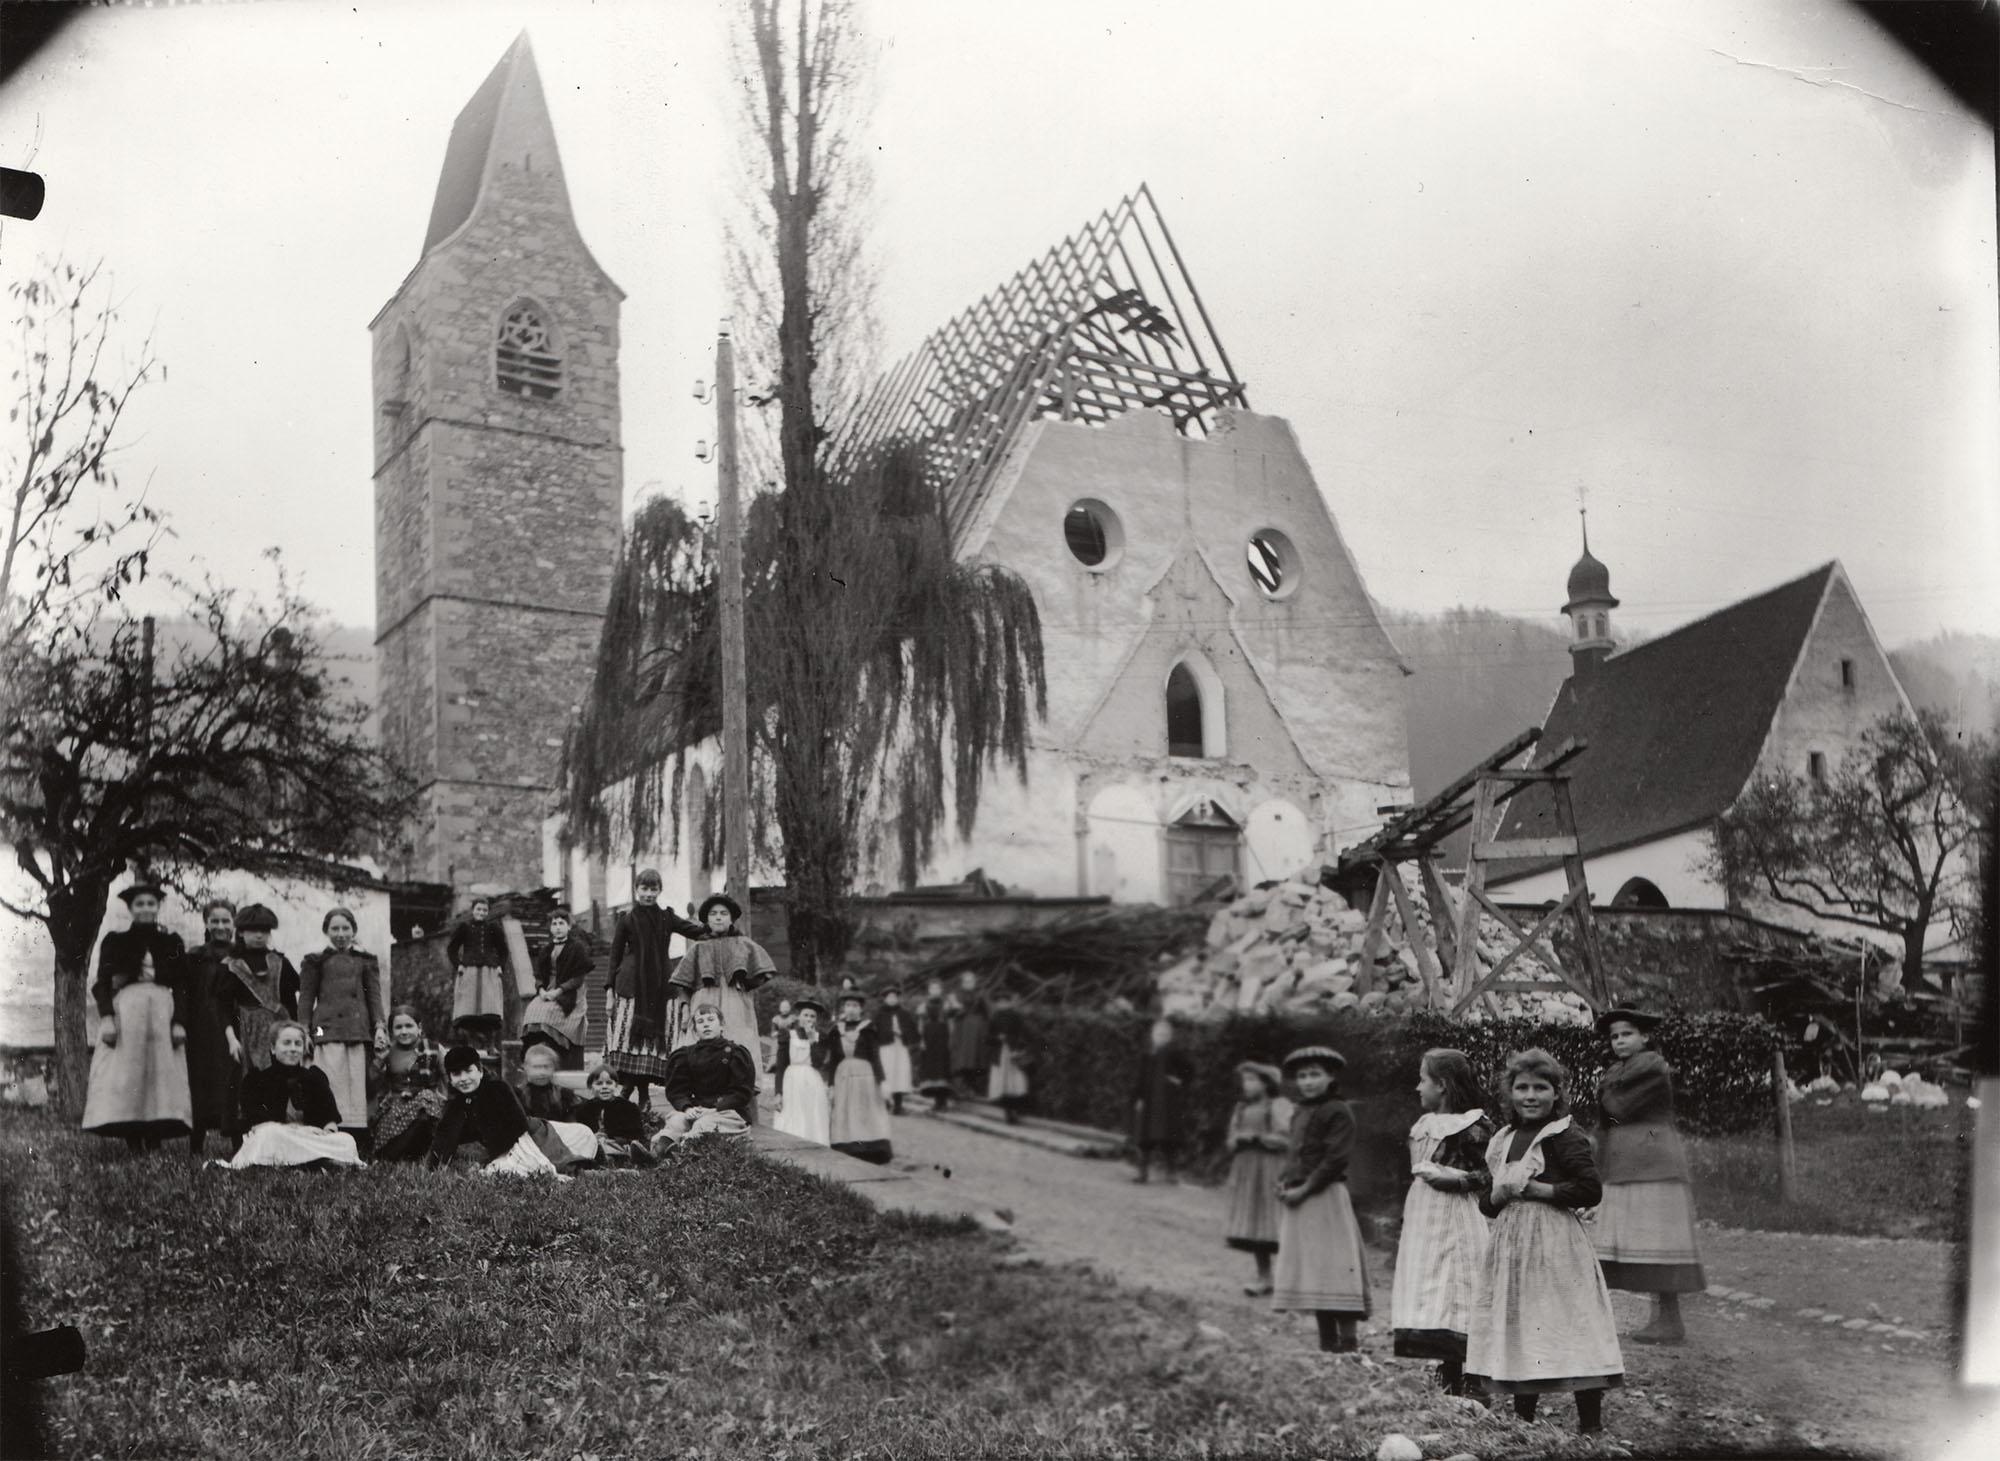 Abbruch der alten Kirche St. Michael